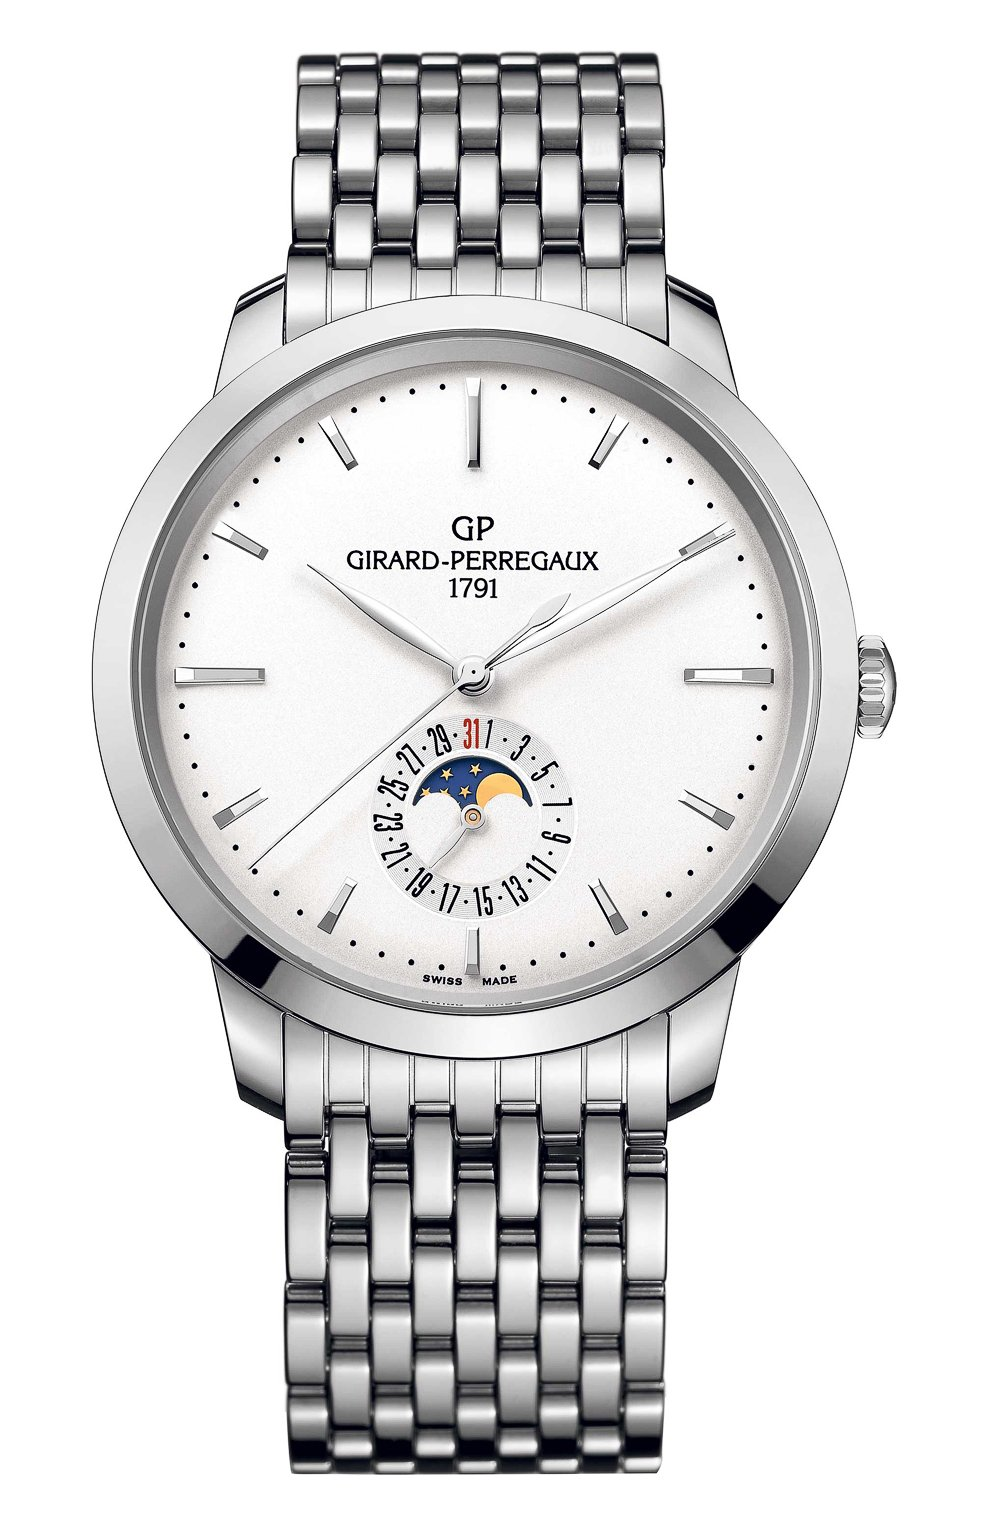 Мужские часы steel moon phase white GIRARD-PERREGAUX бесцветного цвета, арт. 49545-11-131-BB60   Фото 1 (Механизм: Автомат; Материал корпуса: Сталь; Цвет циферблата: Белый)